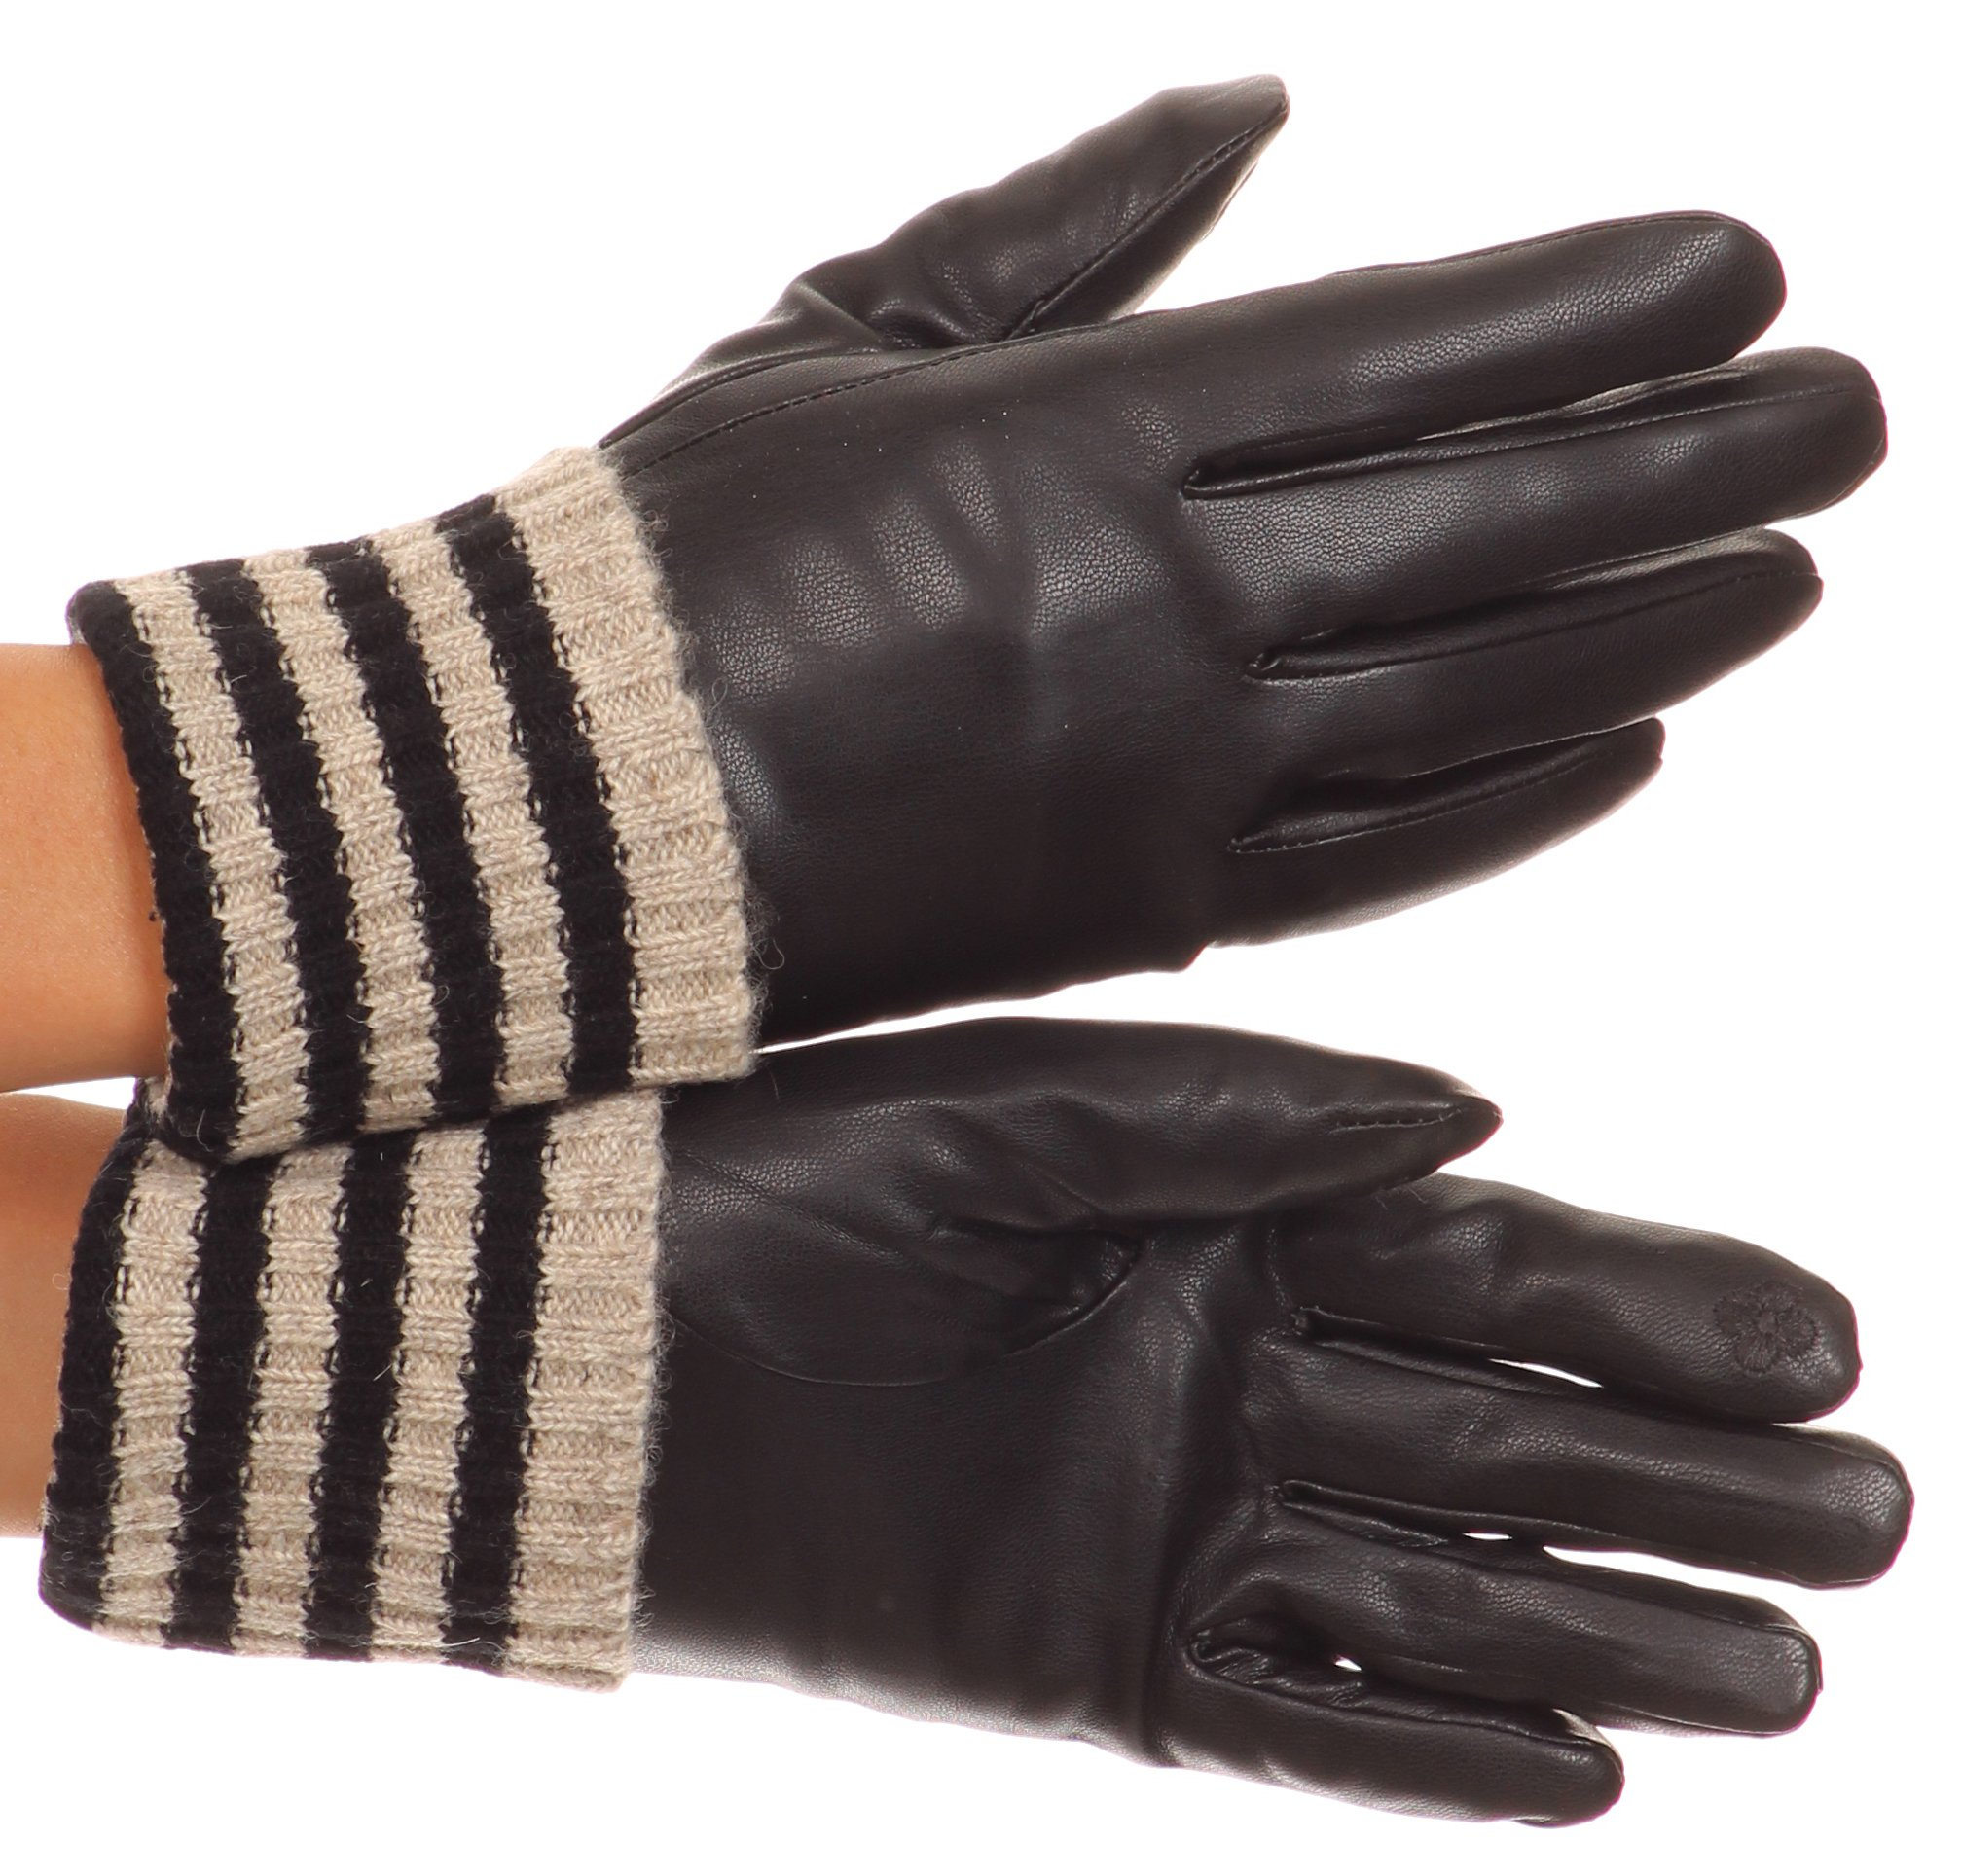 Sakkas CMZ1523 - Oda Warm Striped Wool Cuff Winter Touch Screen Wrist Length Gloves - Black - Large